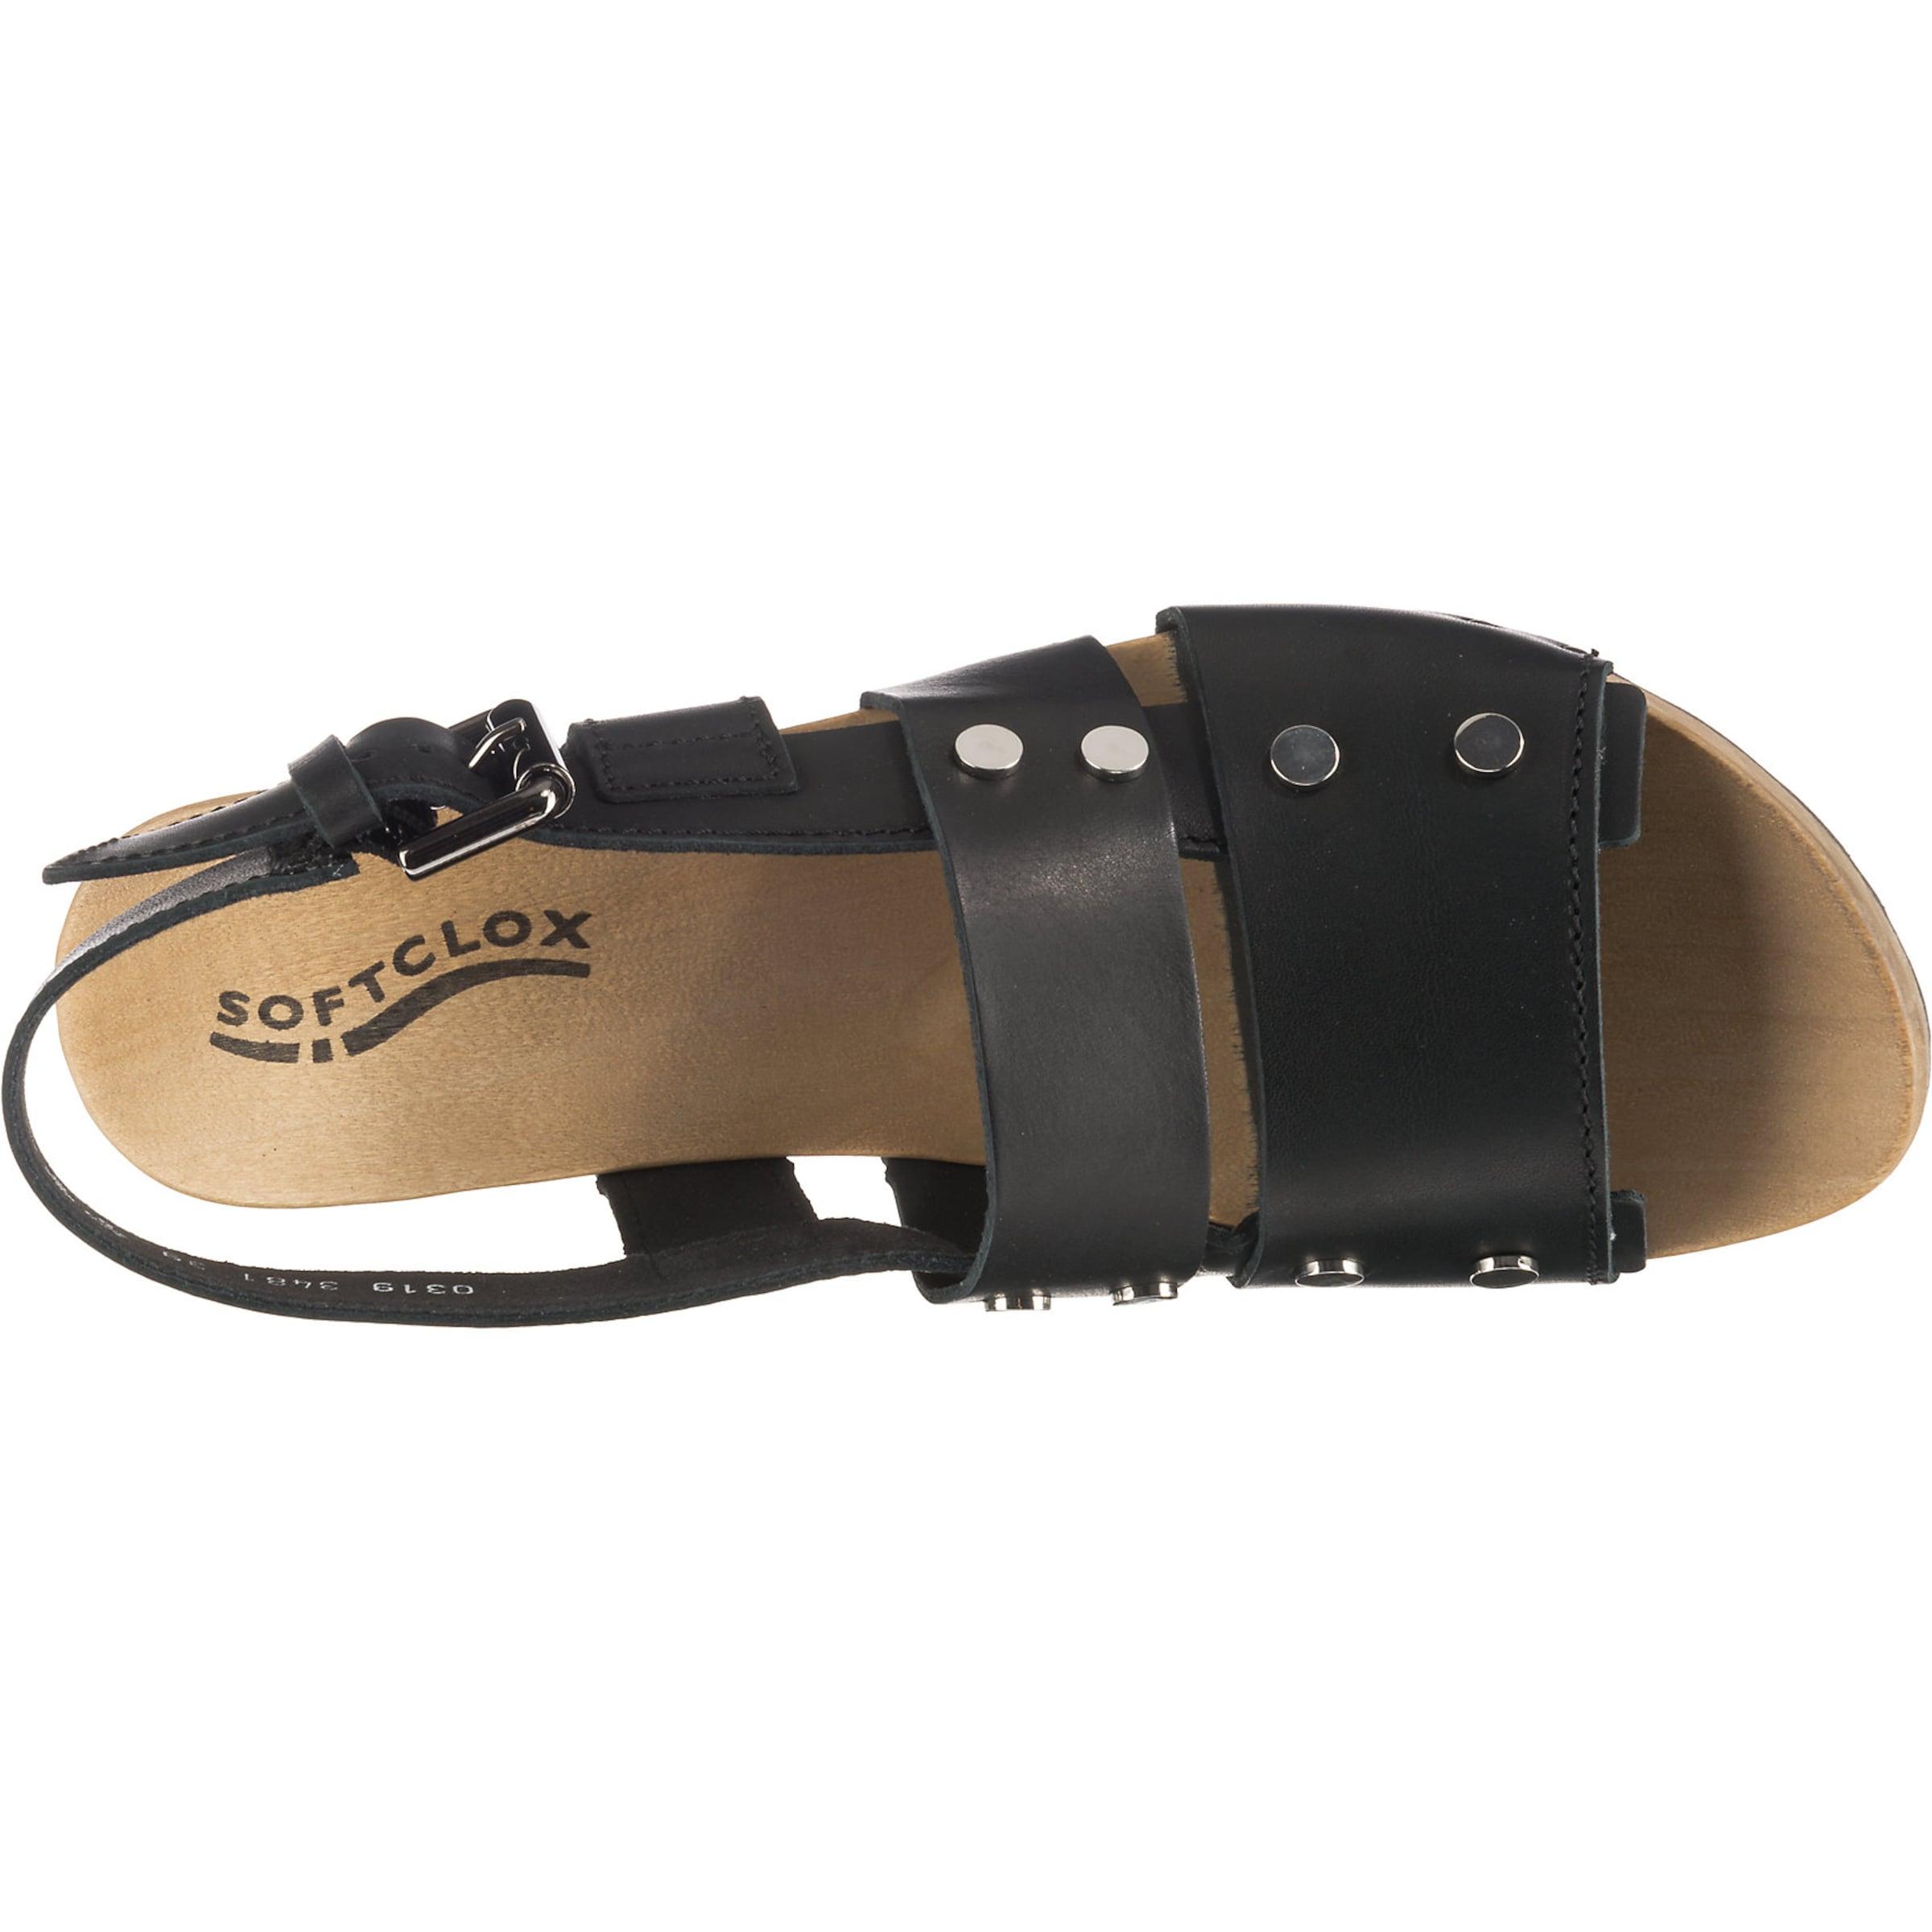 Softclox Sandaletten 'pamela' Softclox Schwarz In rBWdCeox